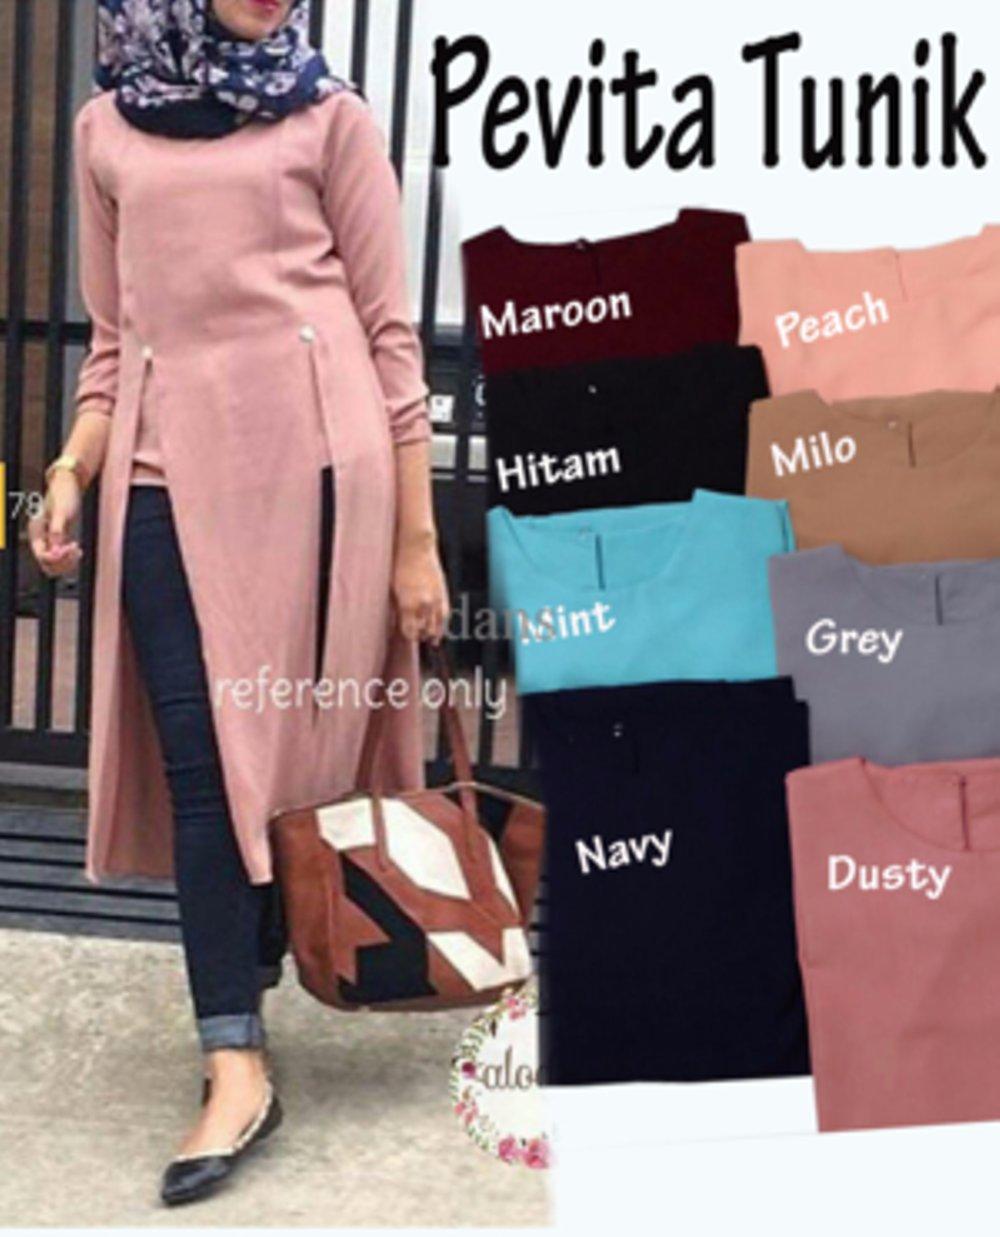 Baju Atasan Wanita Tunik Baju Muslim Blus Muslim Pevita / Blouse Wanita / Blouse muslimah /